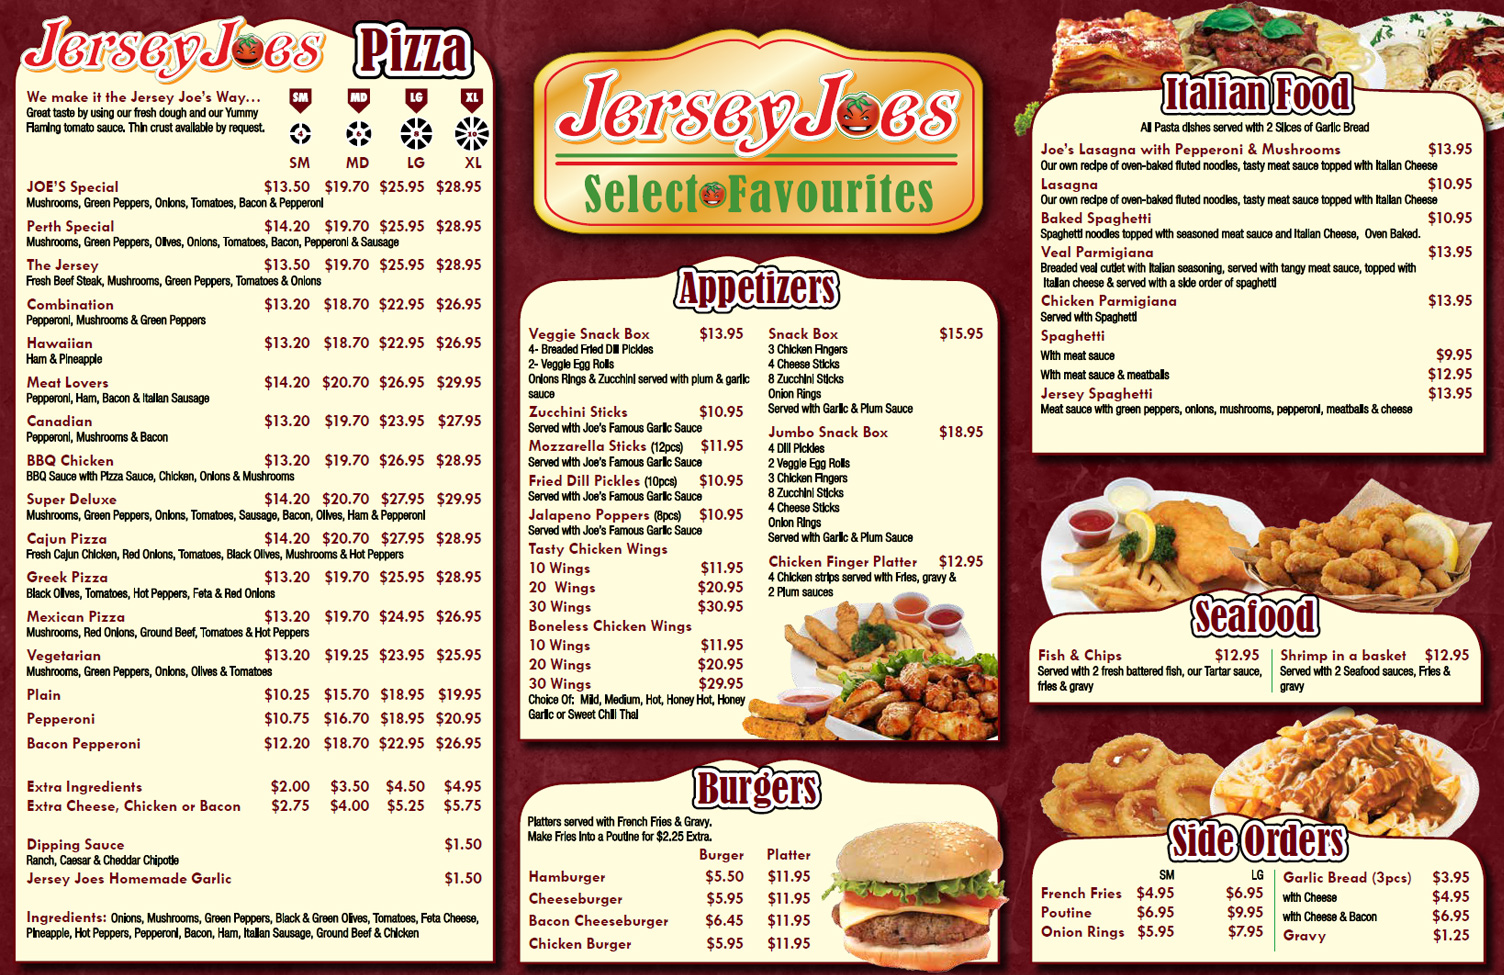 jersey joe's